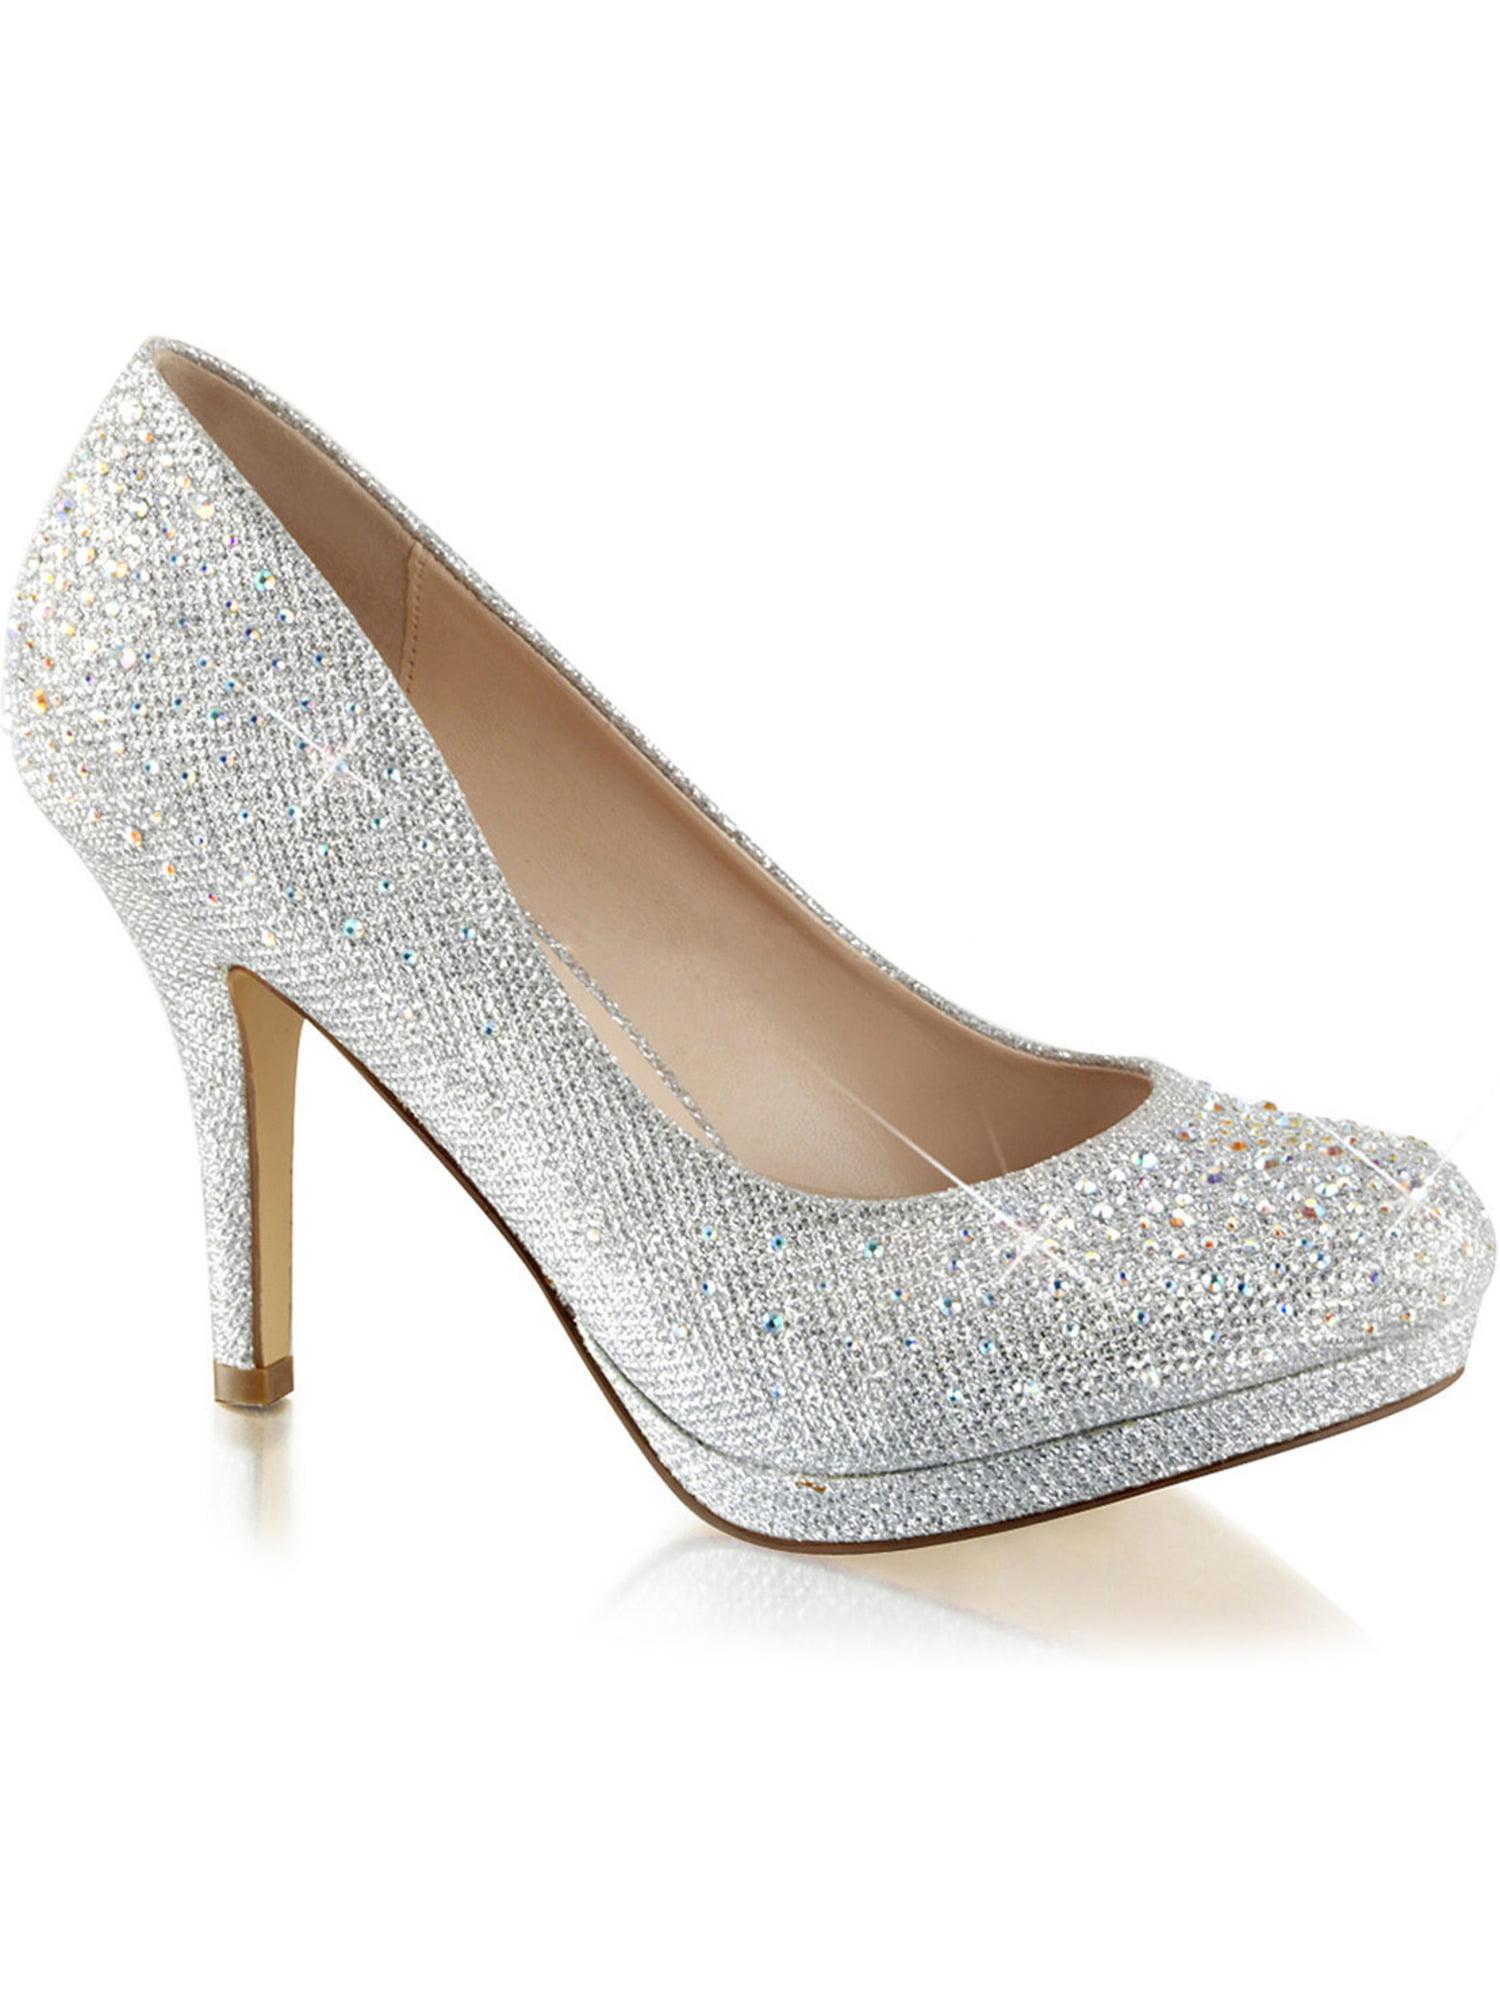 6c0df991672 SummitFashions - Womens Silver Rhinestone Shoes Glitter Pumps Sparkly High  Heels 3 1 2 Inch Heel - Walmart.com